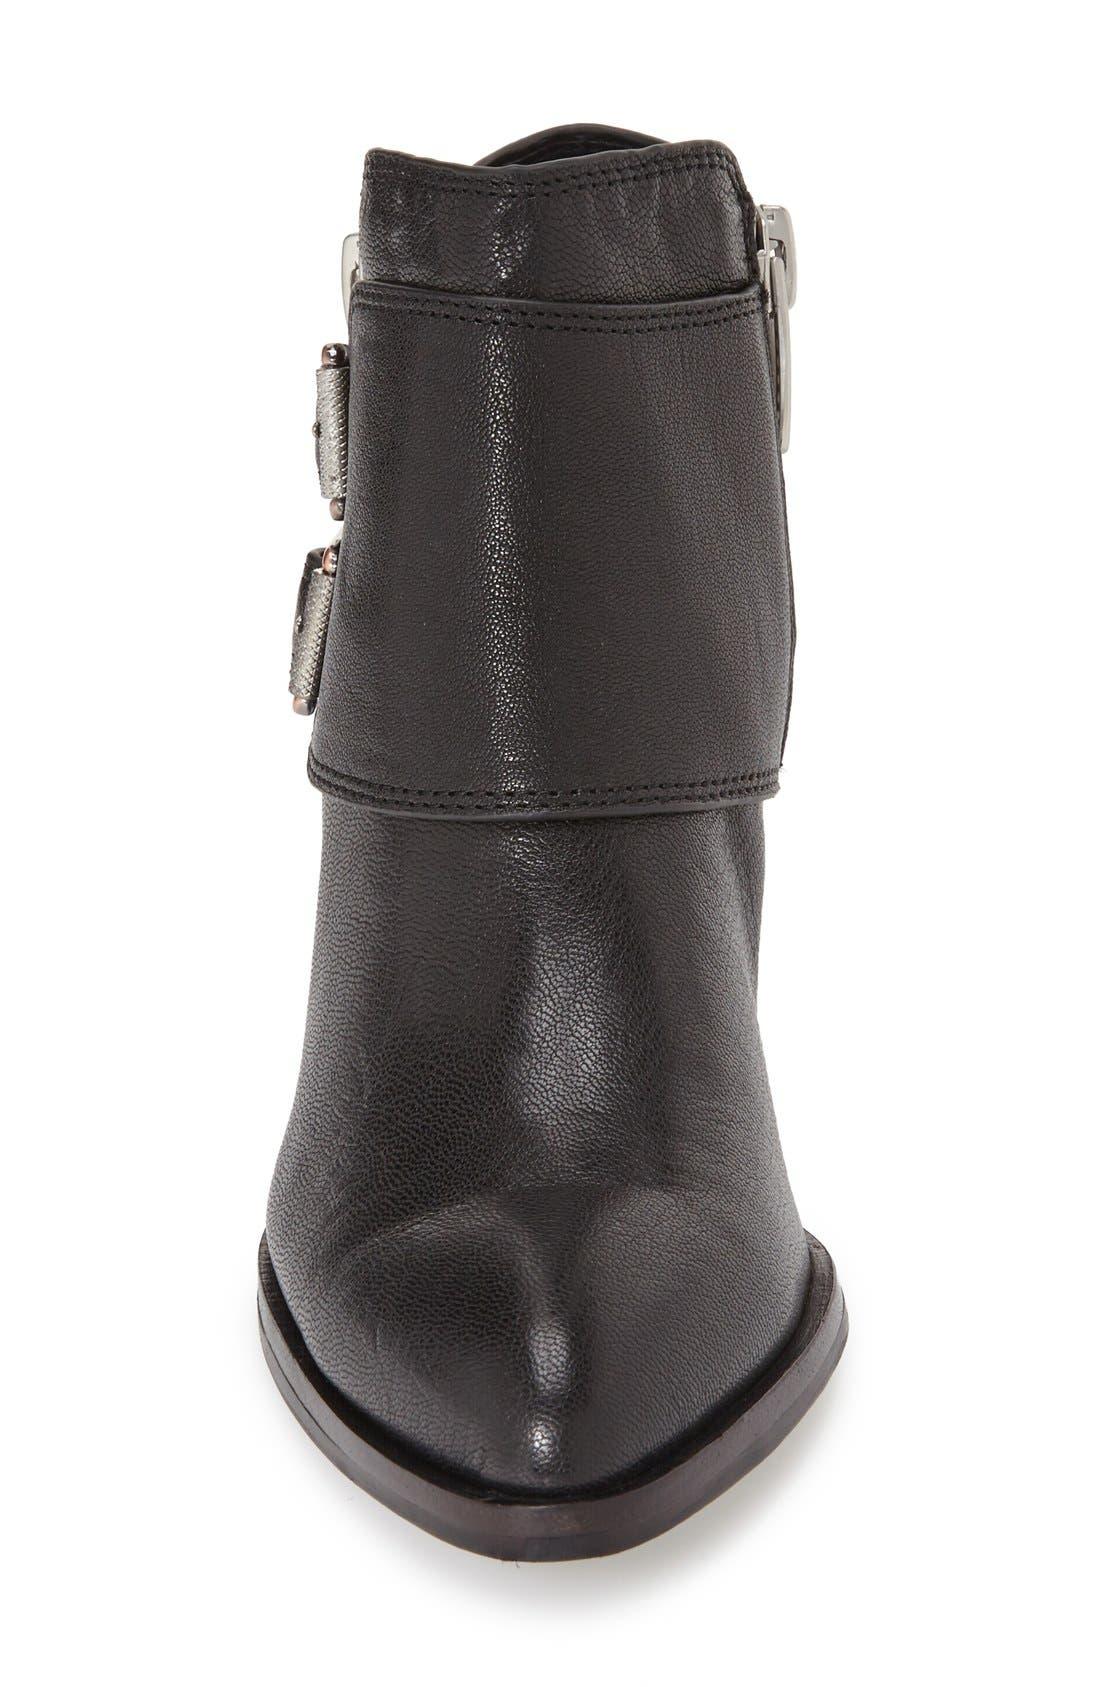 Alternate Image 3  - Calvin Klein 'Neveah' Monk Strap Bootie (Women)